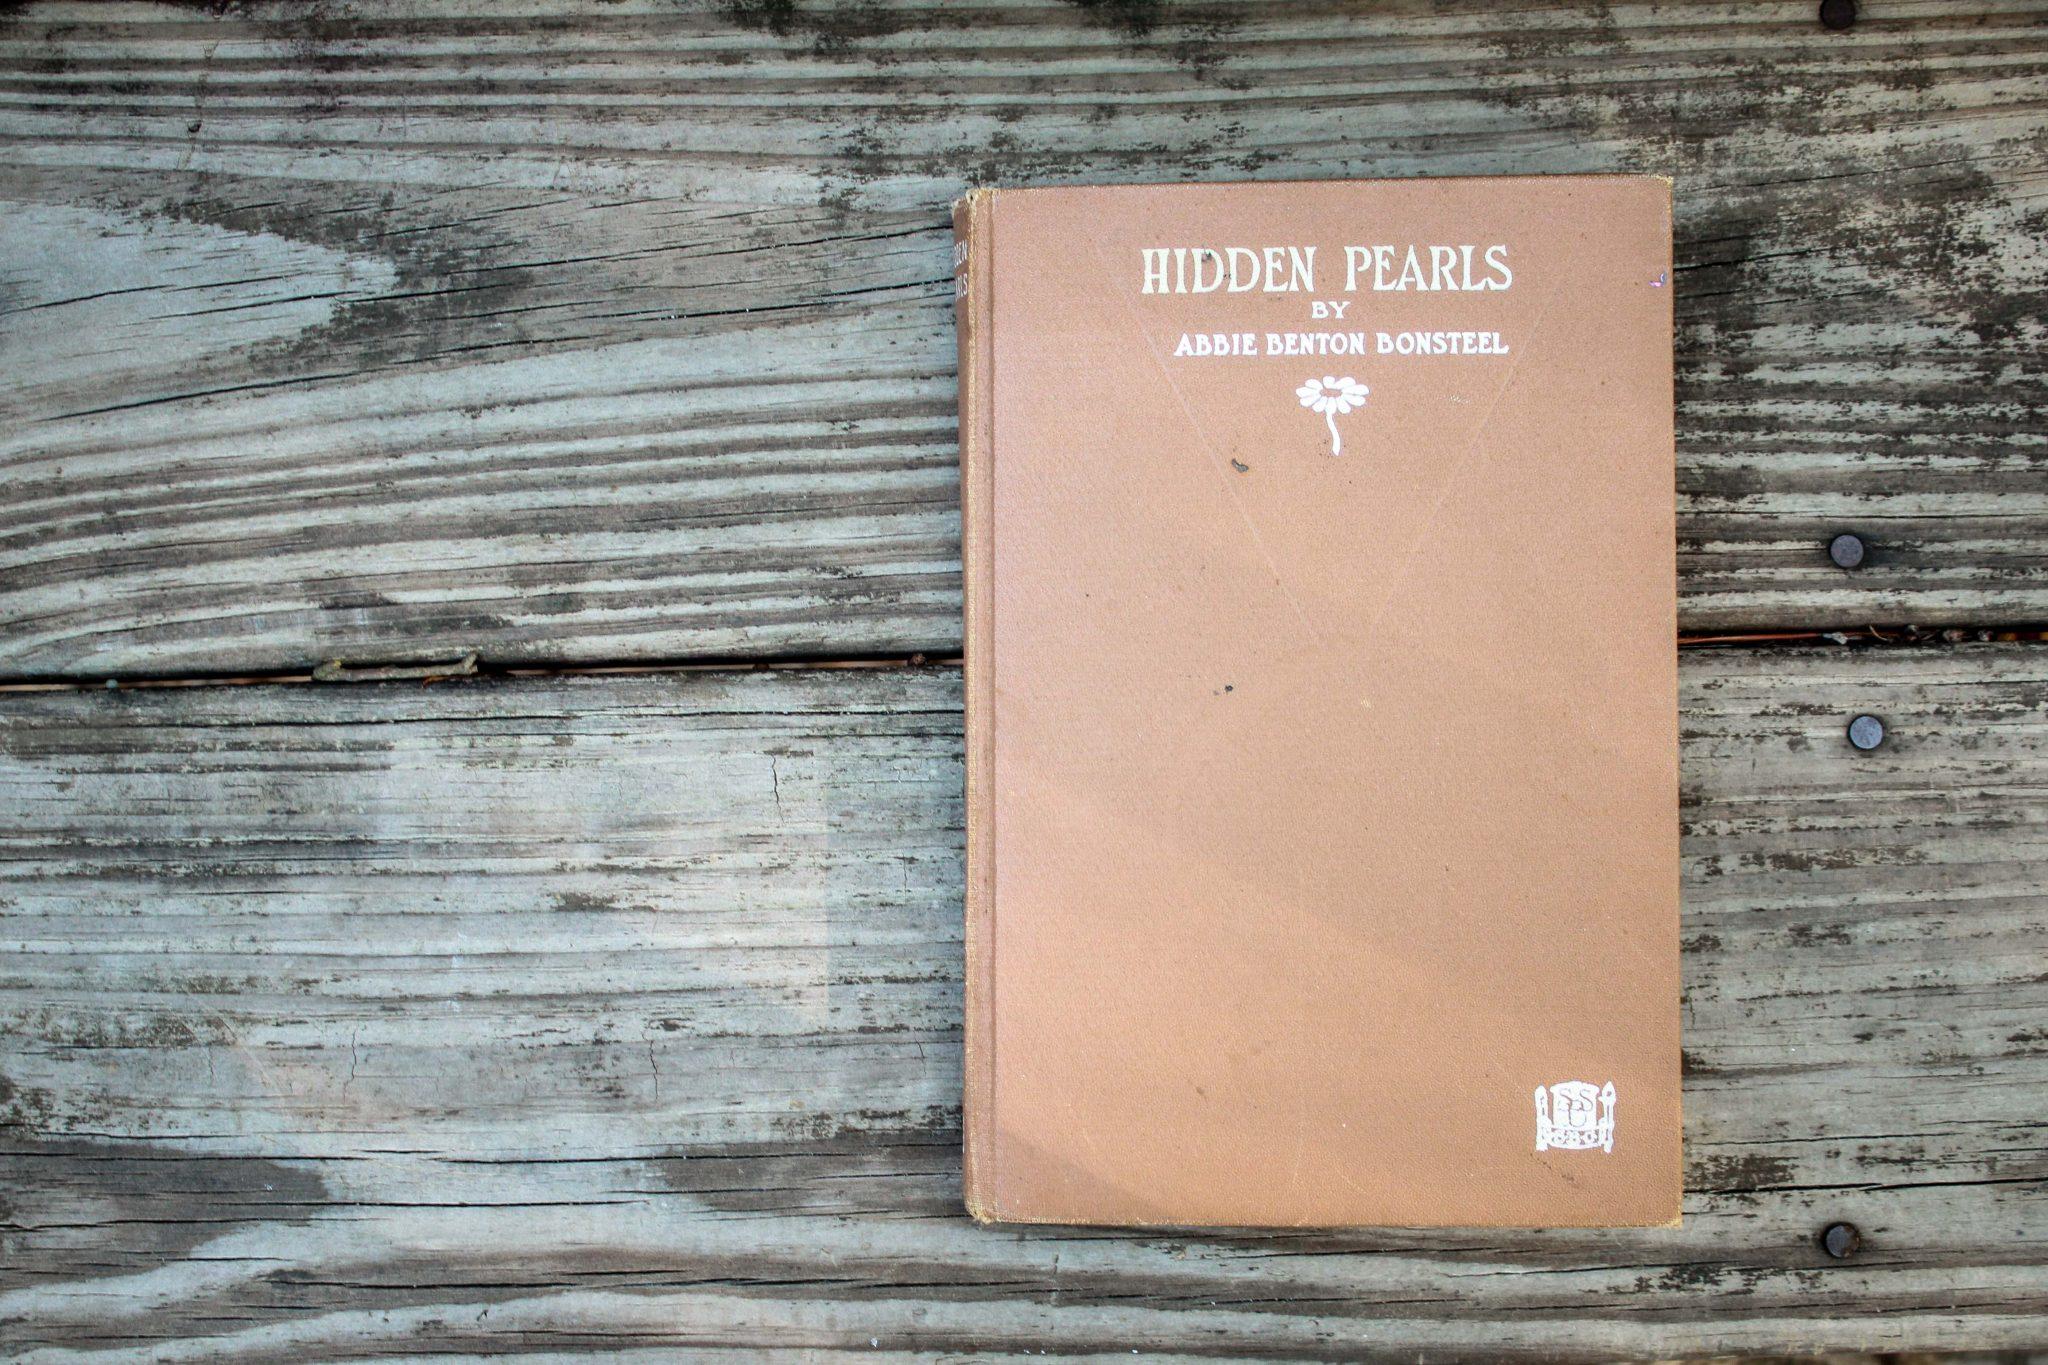 Hidden Pearls by Abbie Benton Bonsteel. Art Journaling. Antique Books. Repurposing. Upcycling.   Videmus Art. Syd Wachs.